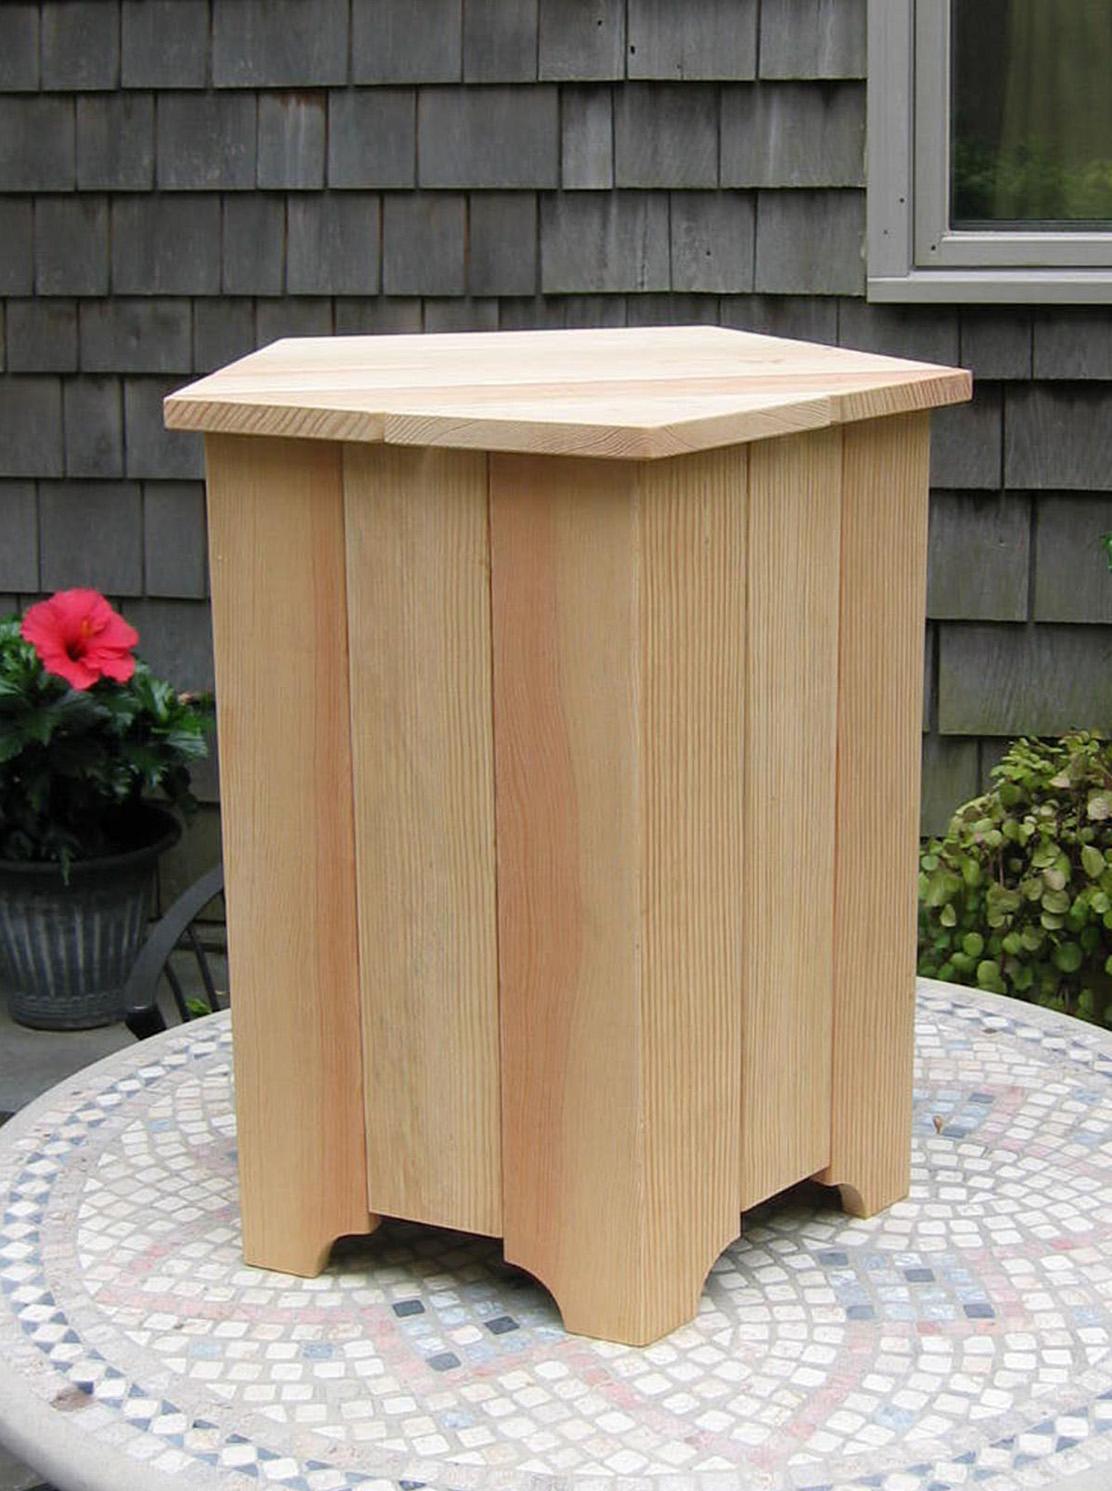 white oak wood 20 lb propane tank cover table